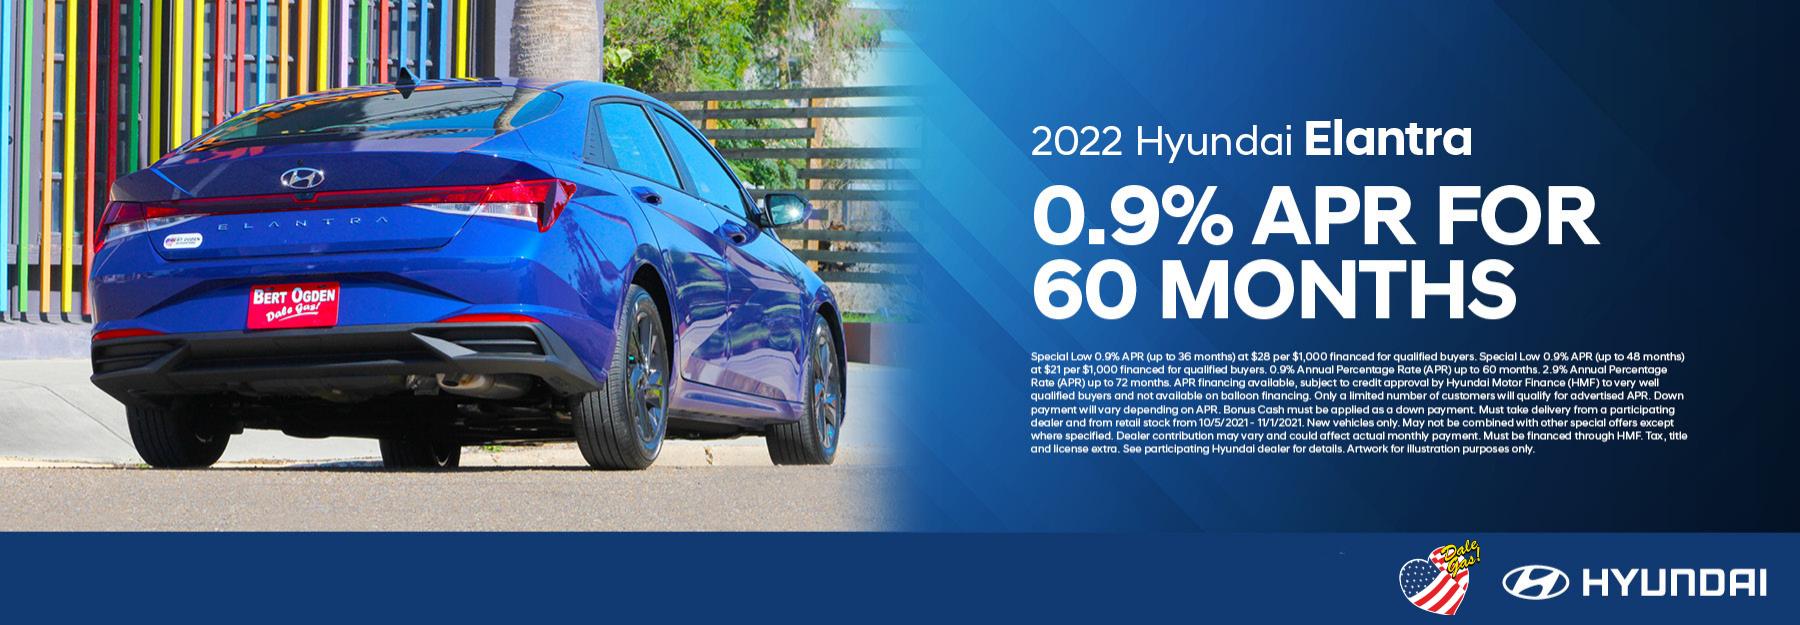 2022 Hyundai Elantra Offer – October 2021